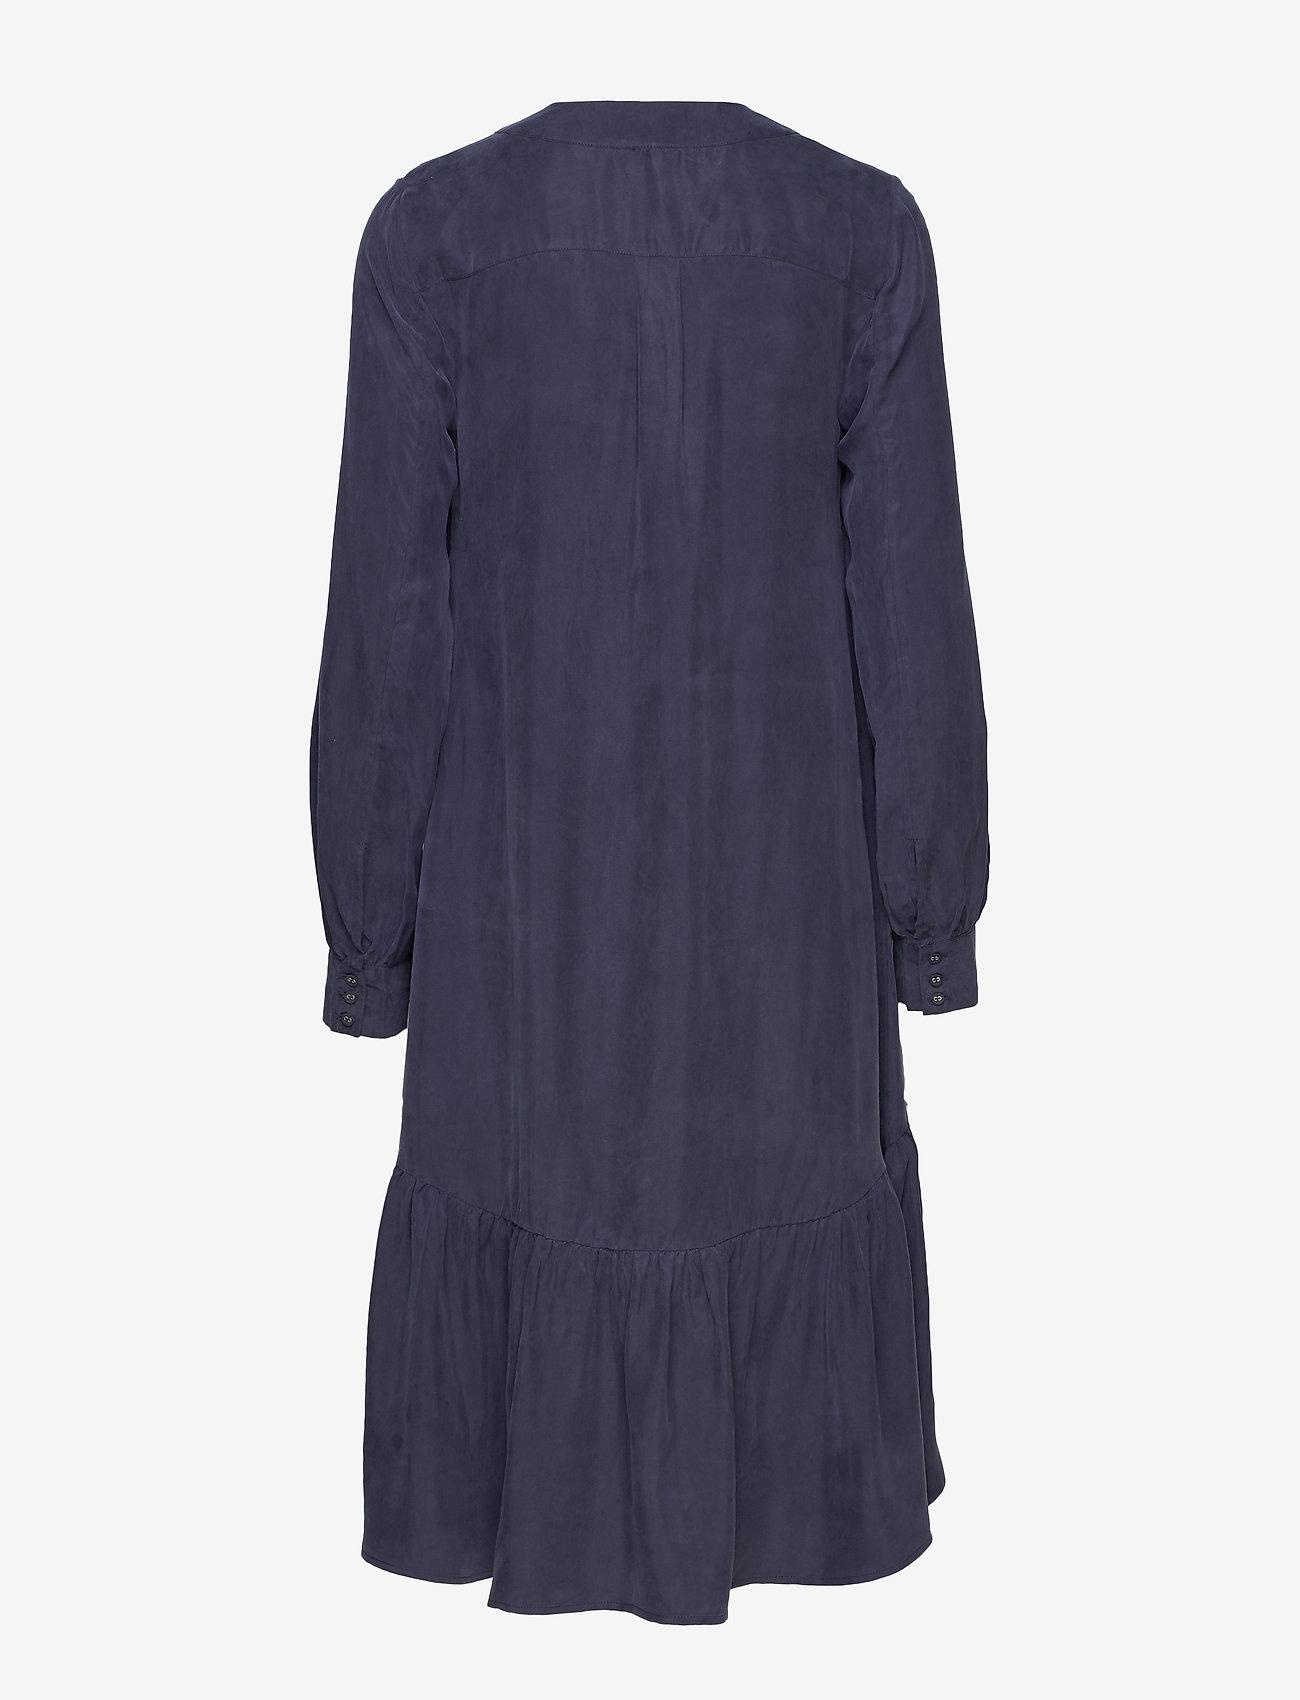 Cuamy Dress (Salute) - Culture CO2vTX